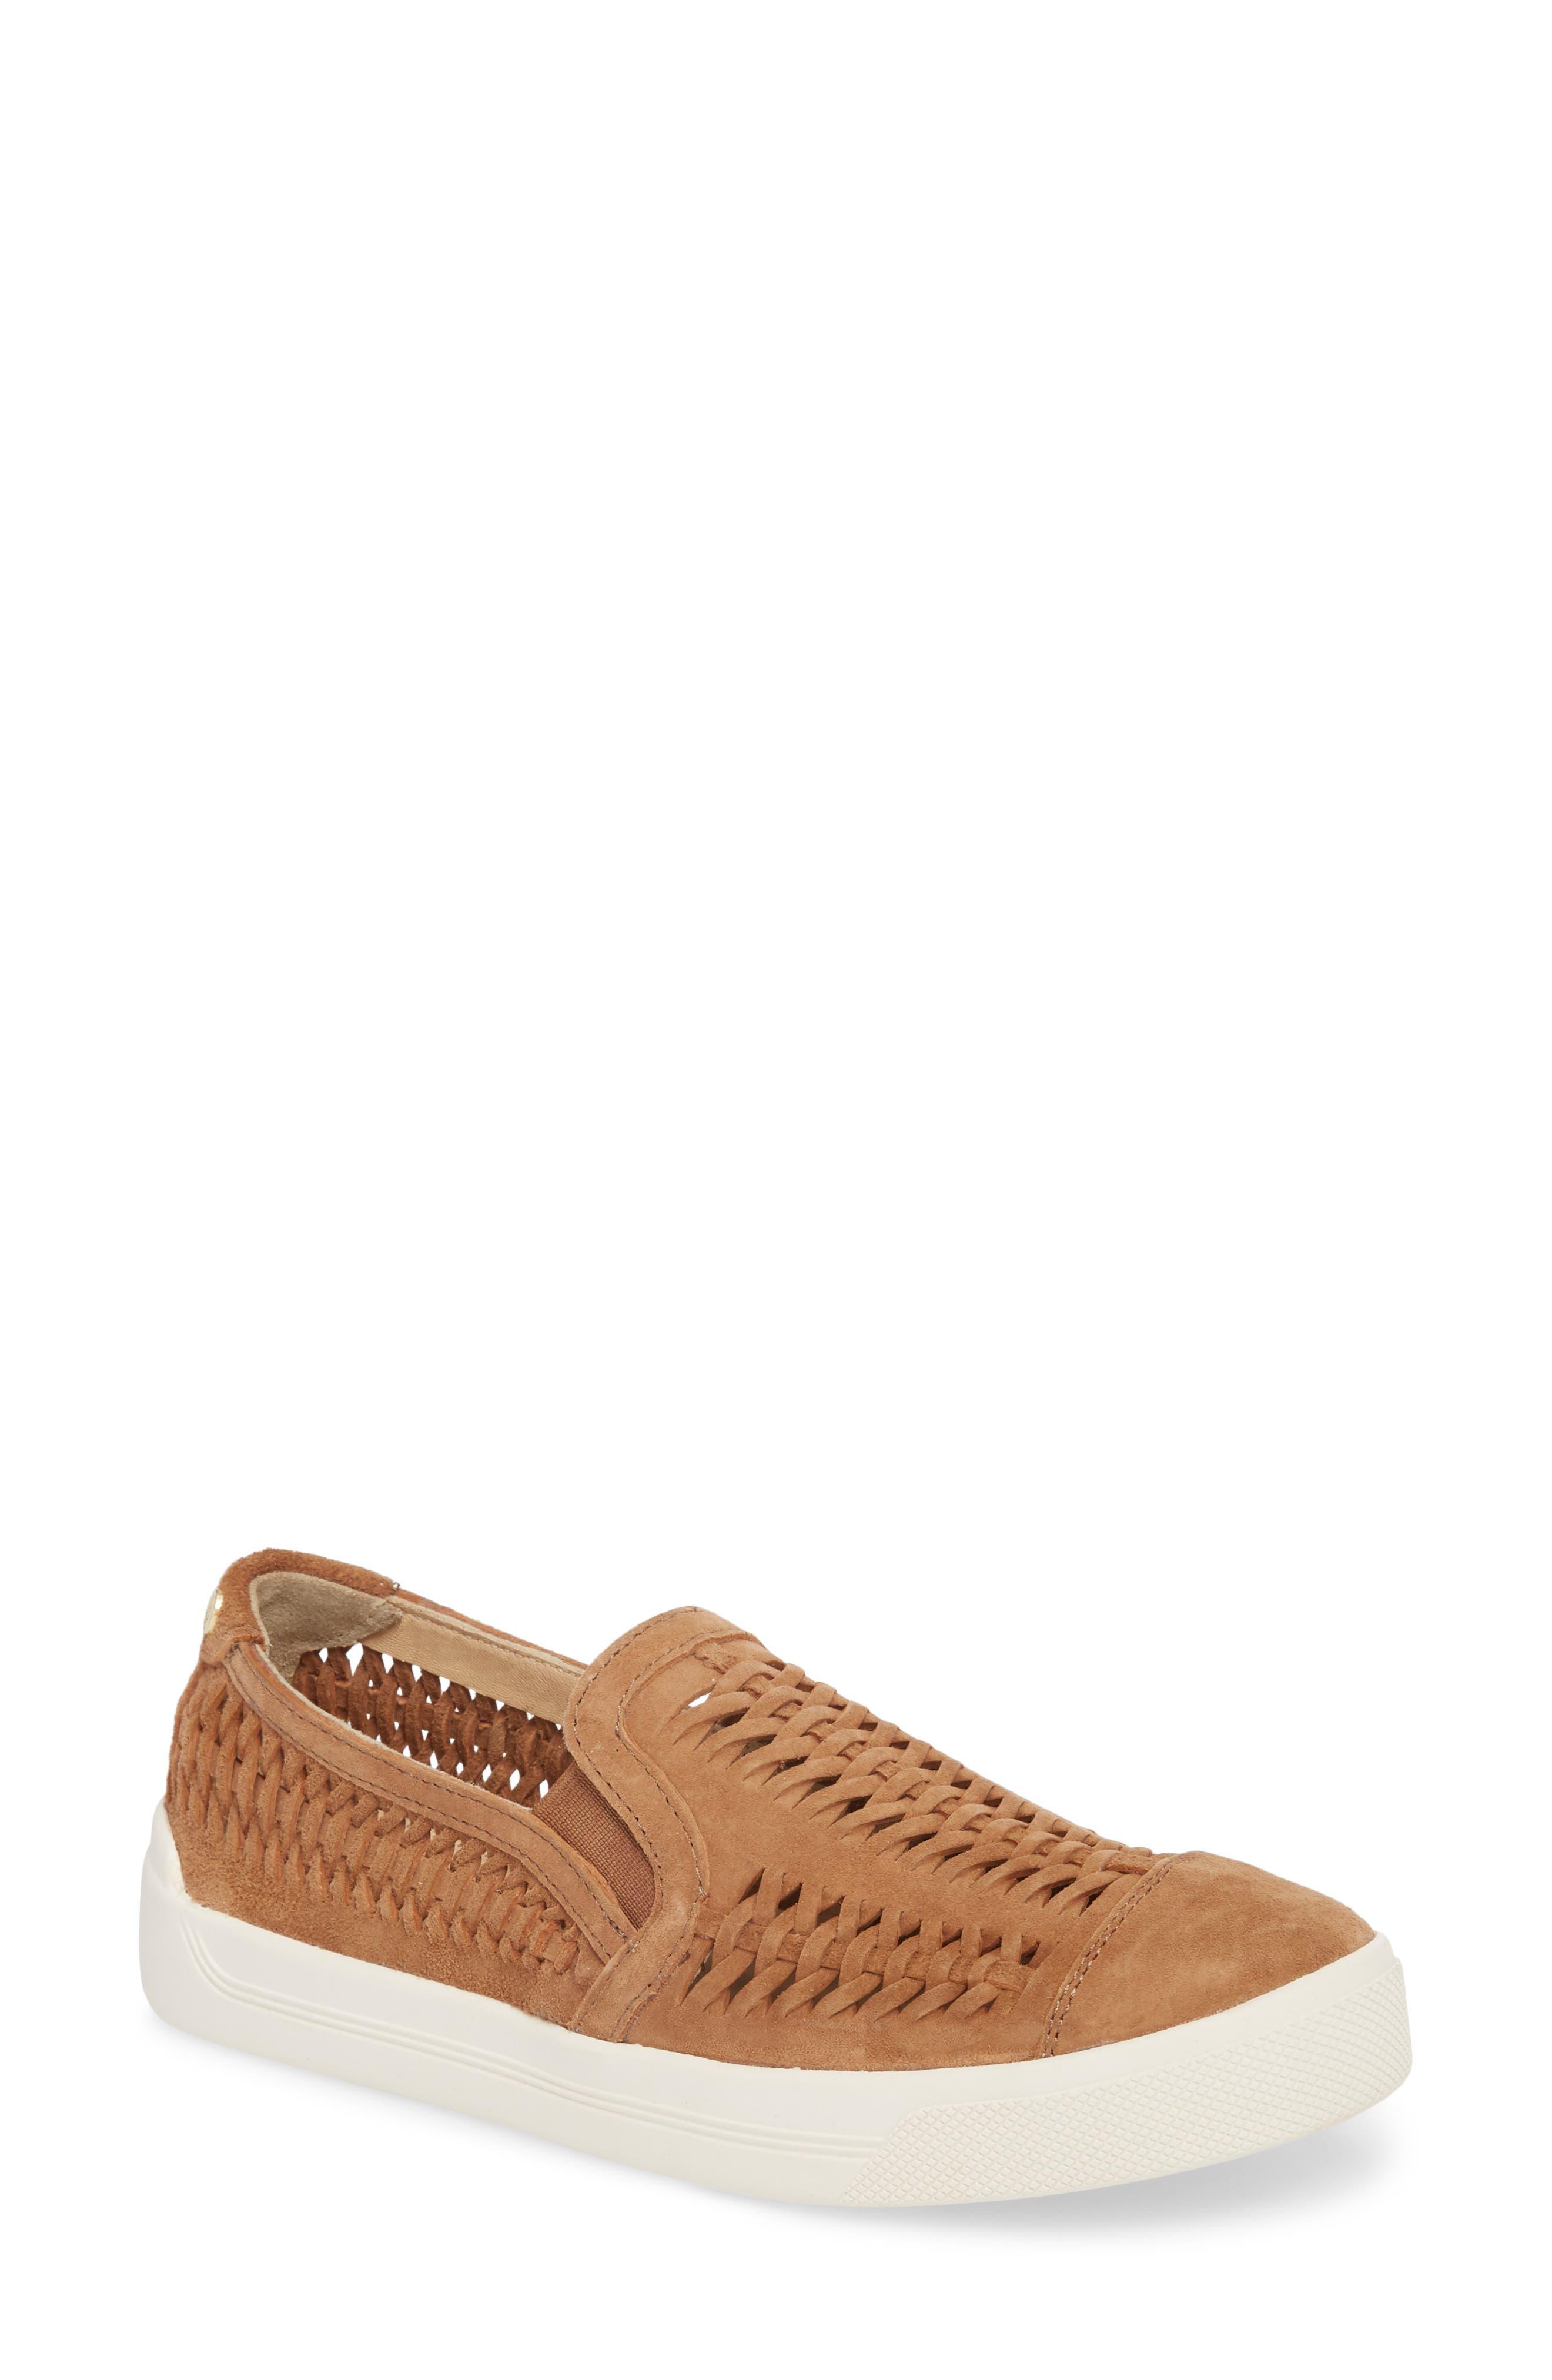 Gabbie Slip-On Sneaker,                         Main,                         color, Tan Suede